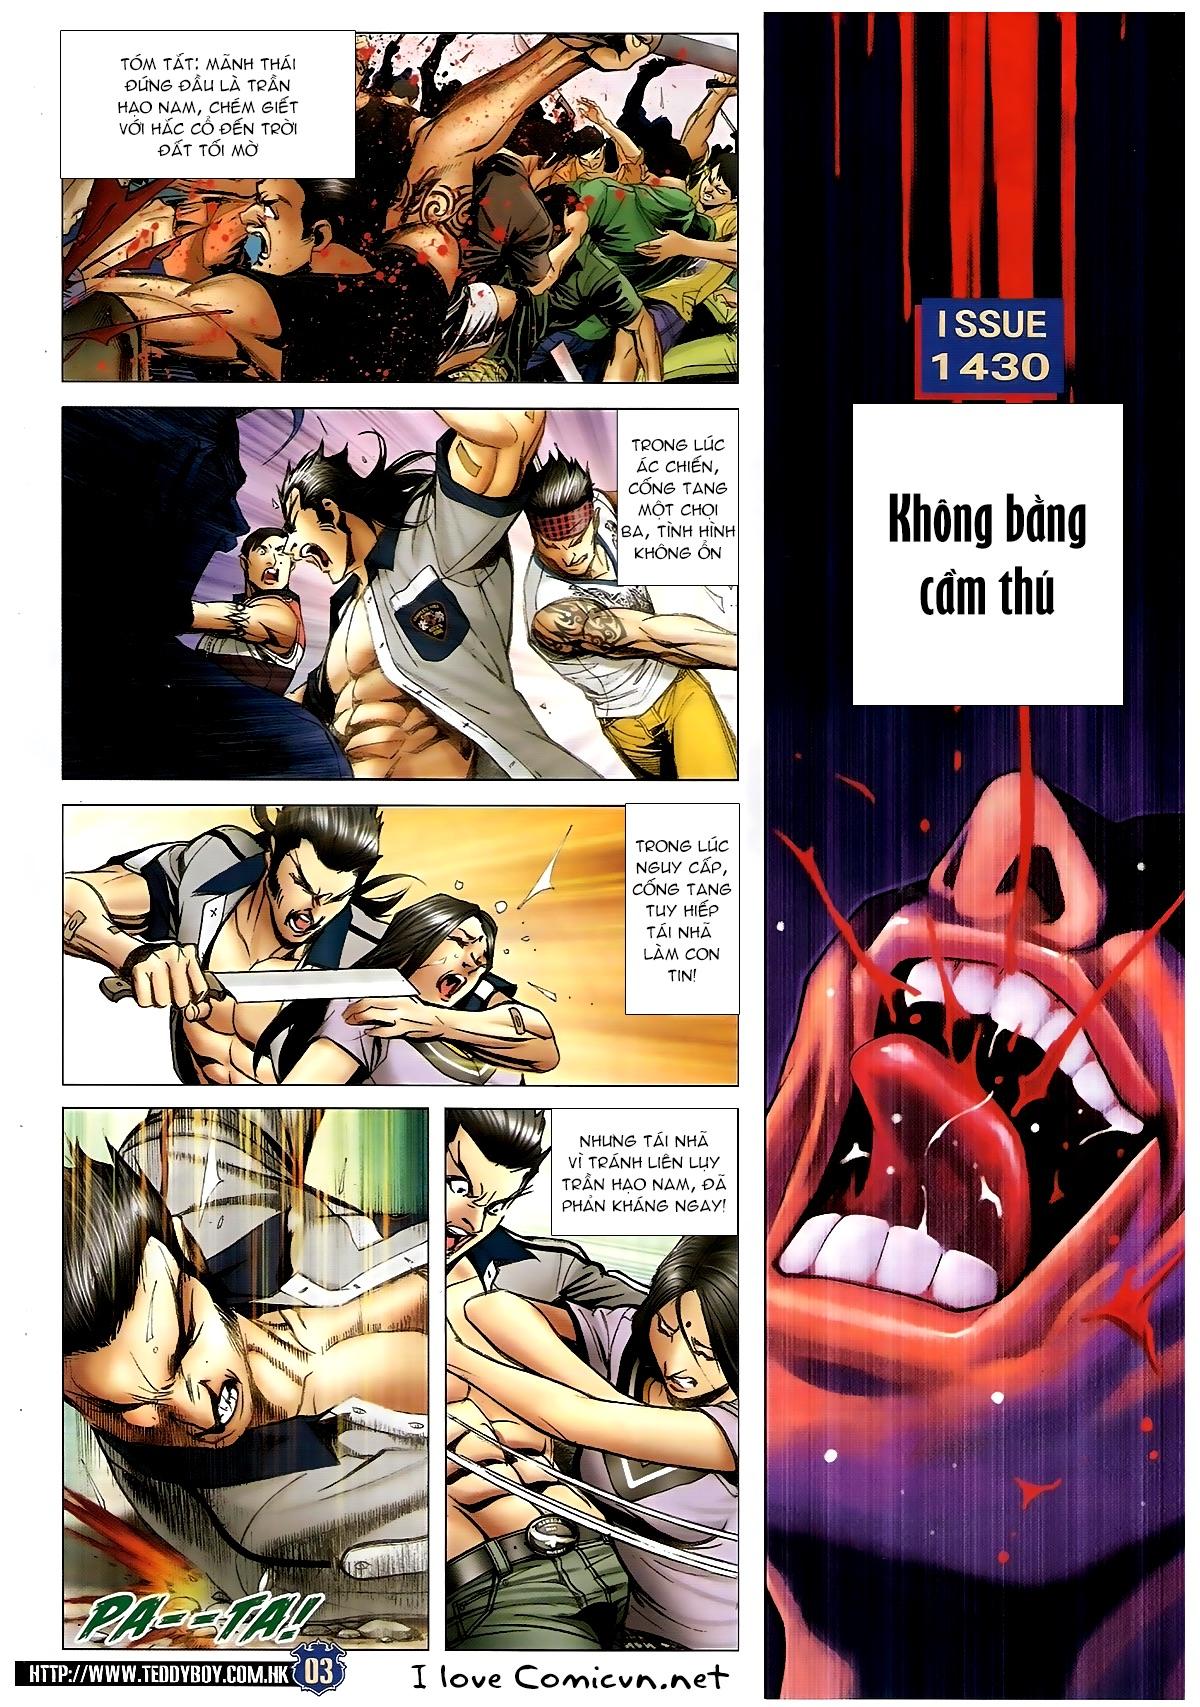 Người Trong Giang Hồ Chapter 1430 - Hamtruyen.vn